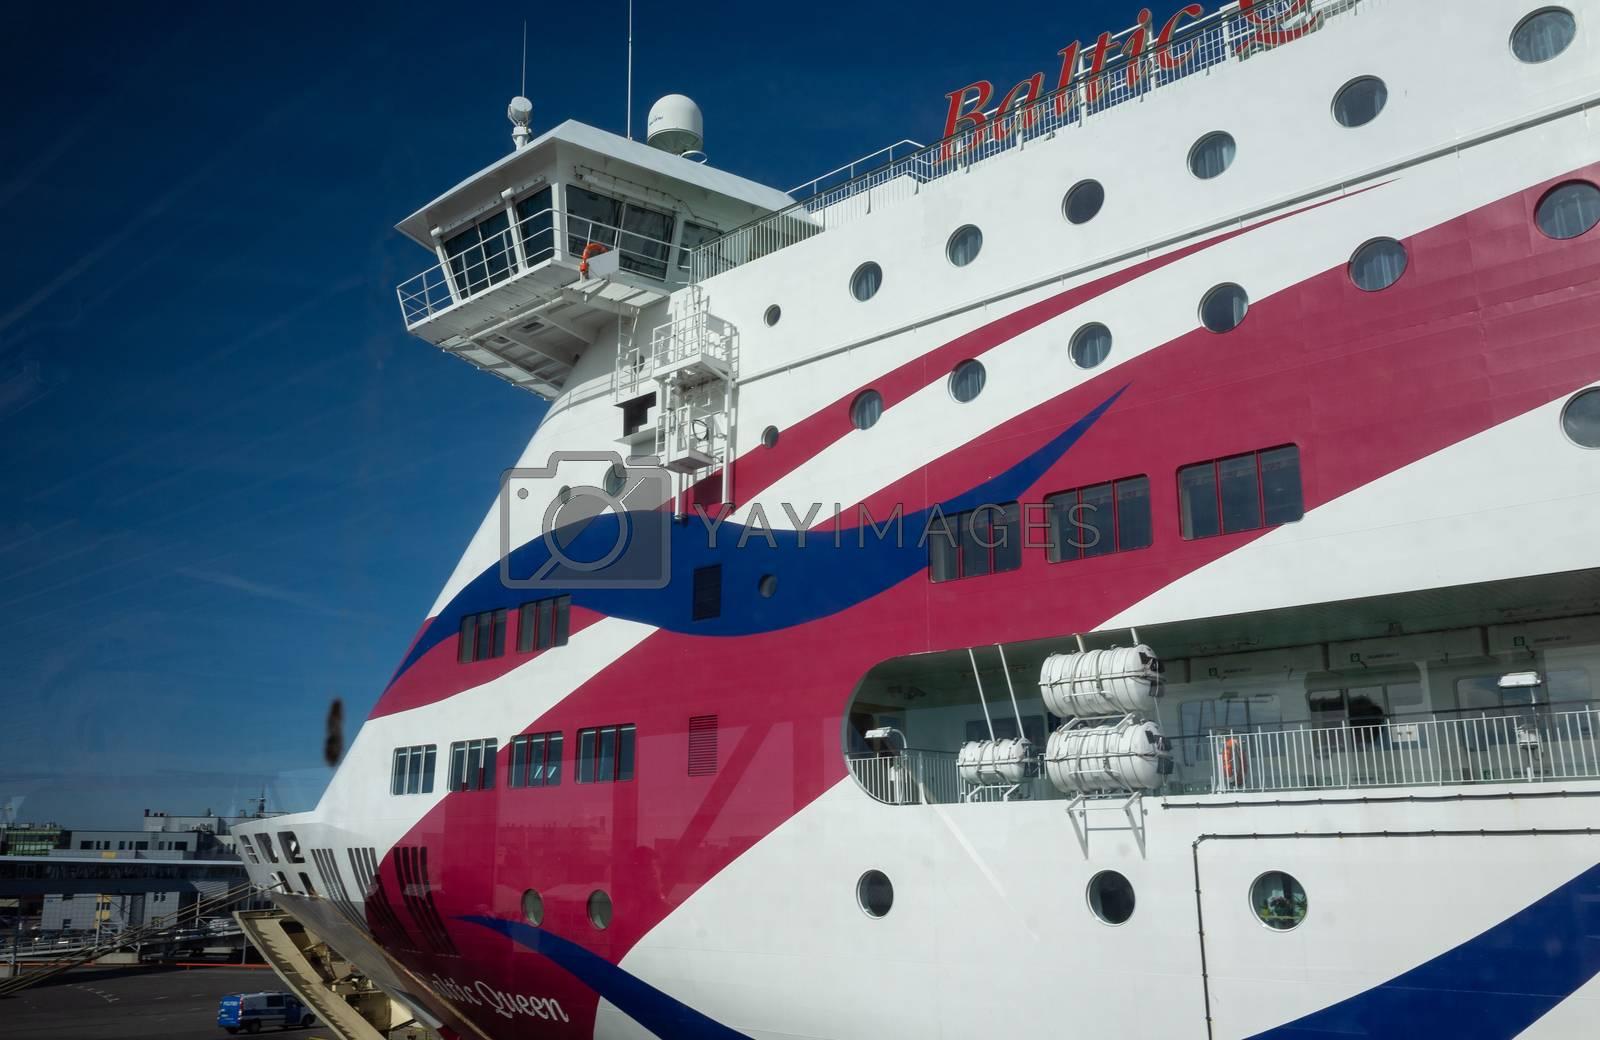 23 April 2019, Tallinn, Estonia. High-speed passenger and car ferry of the Estonian shipping concern Tallink Baltic Queen in the port of Tallinn.